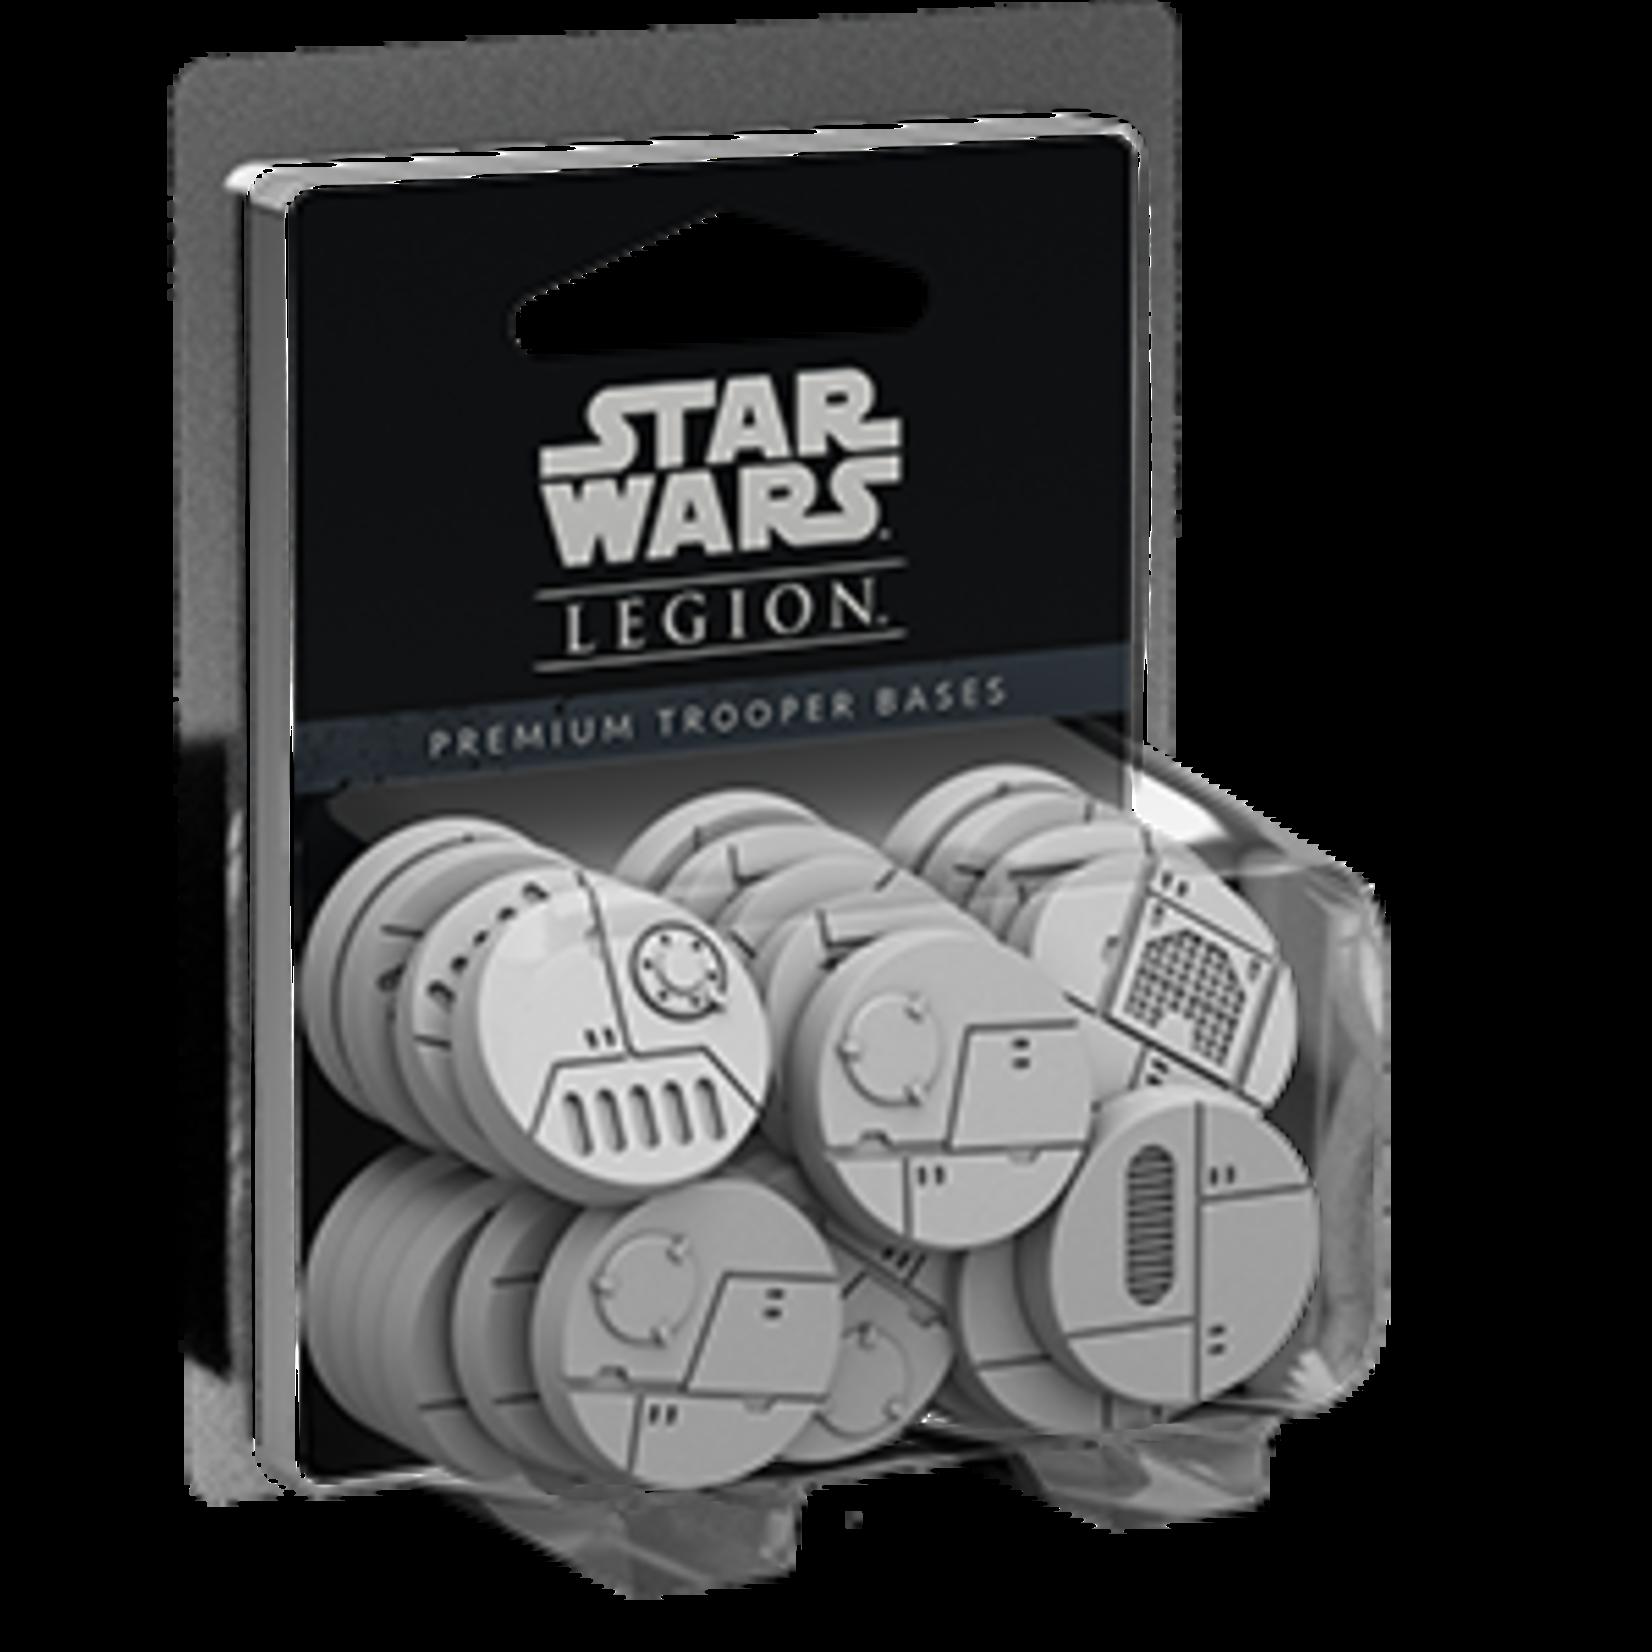 Fantasy Flight Games Star Wars: Legion - Premium Trooper Bases